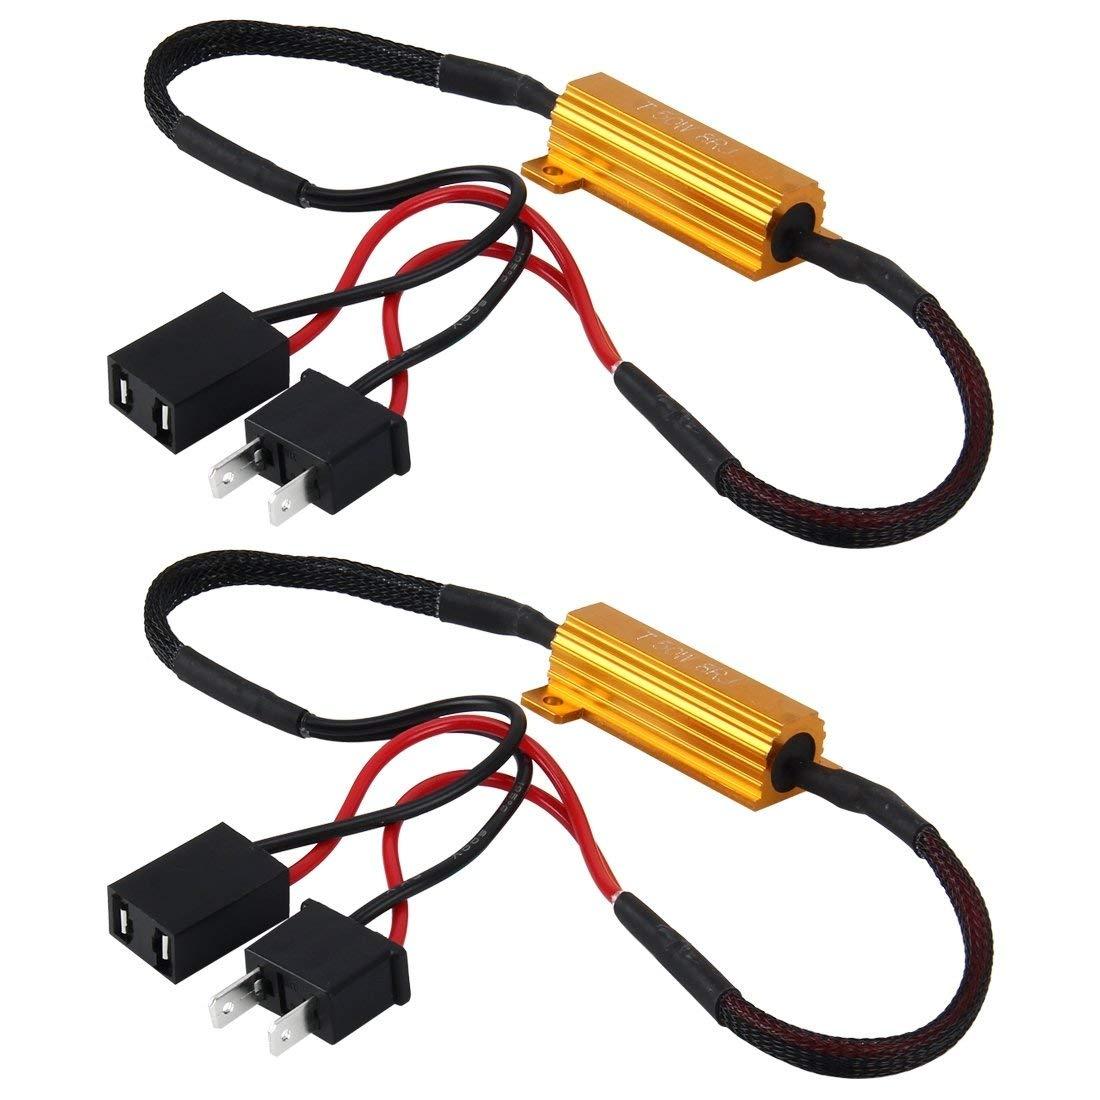 50W H1 H3 H7 H11 9006 Hb3 Hb4 H9 H8 H10 Auto Belastingsweerstand Fout Canceller Led Decoder Canbus gratis Bedrading Canceller Decoder Licht|Auto koplampen (LED)|   -